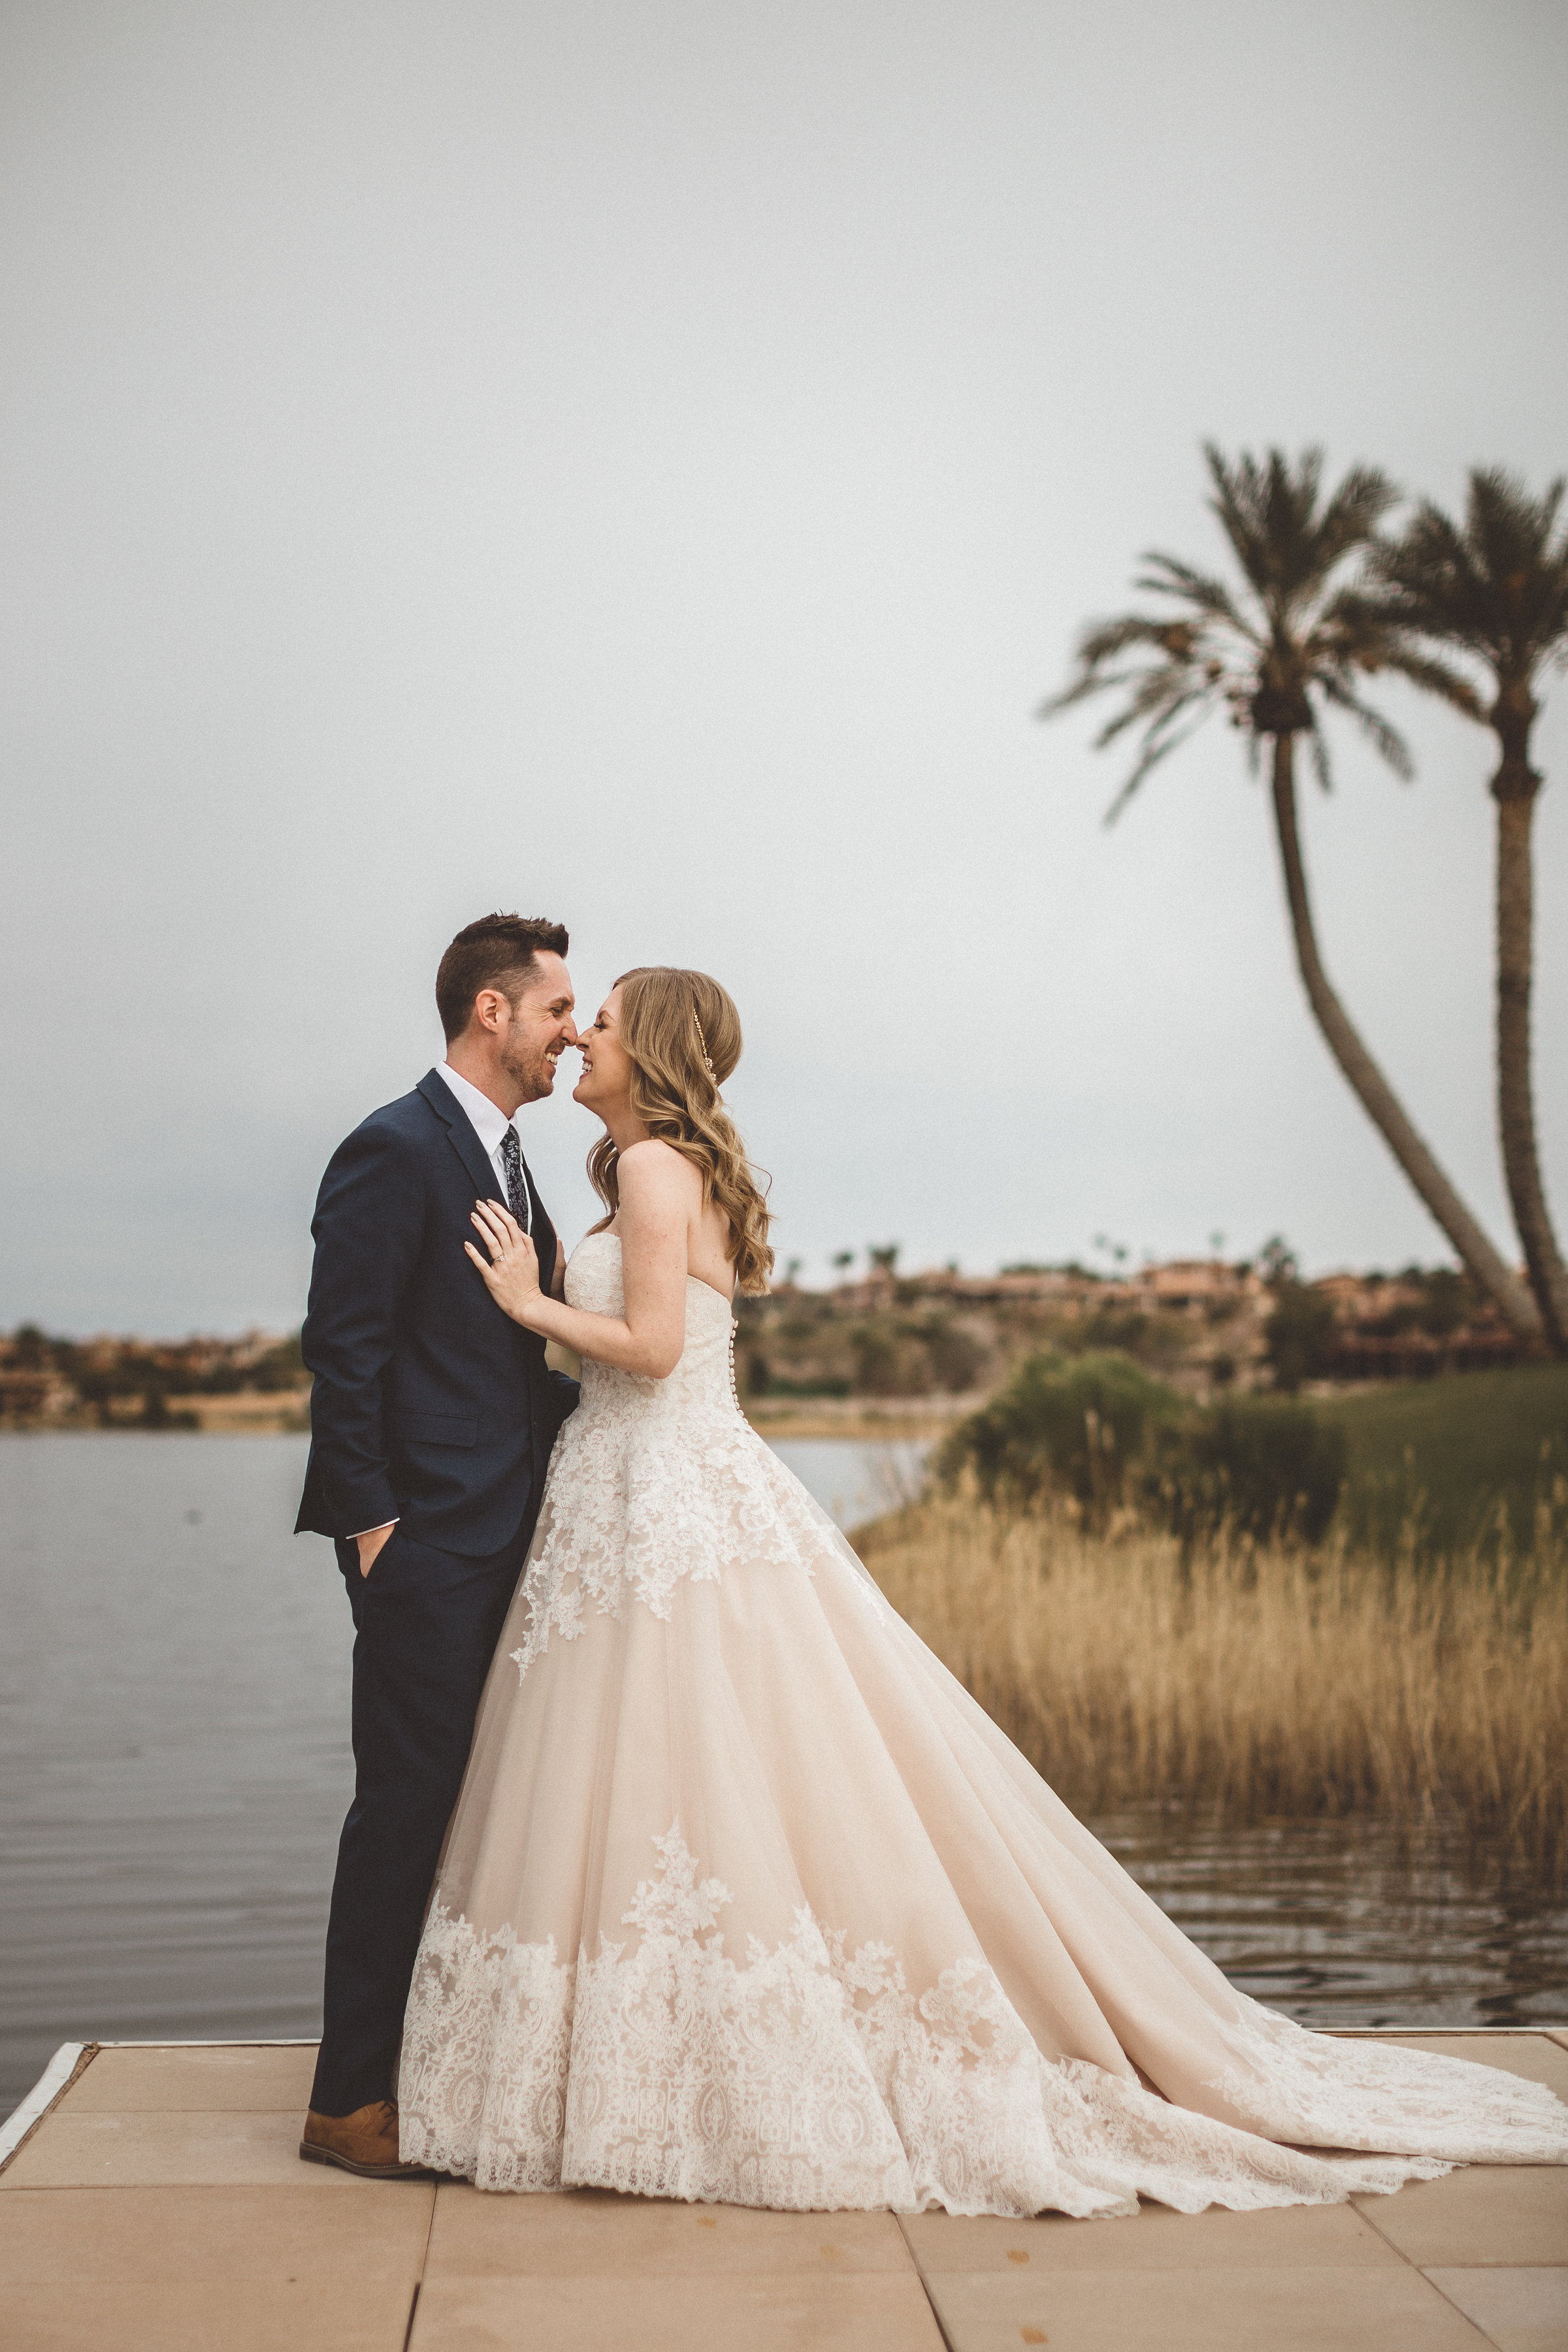 lindsey-and-ryan-intimate-winter-wedding17.jpg